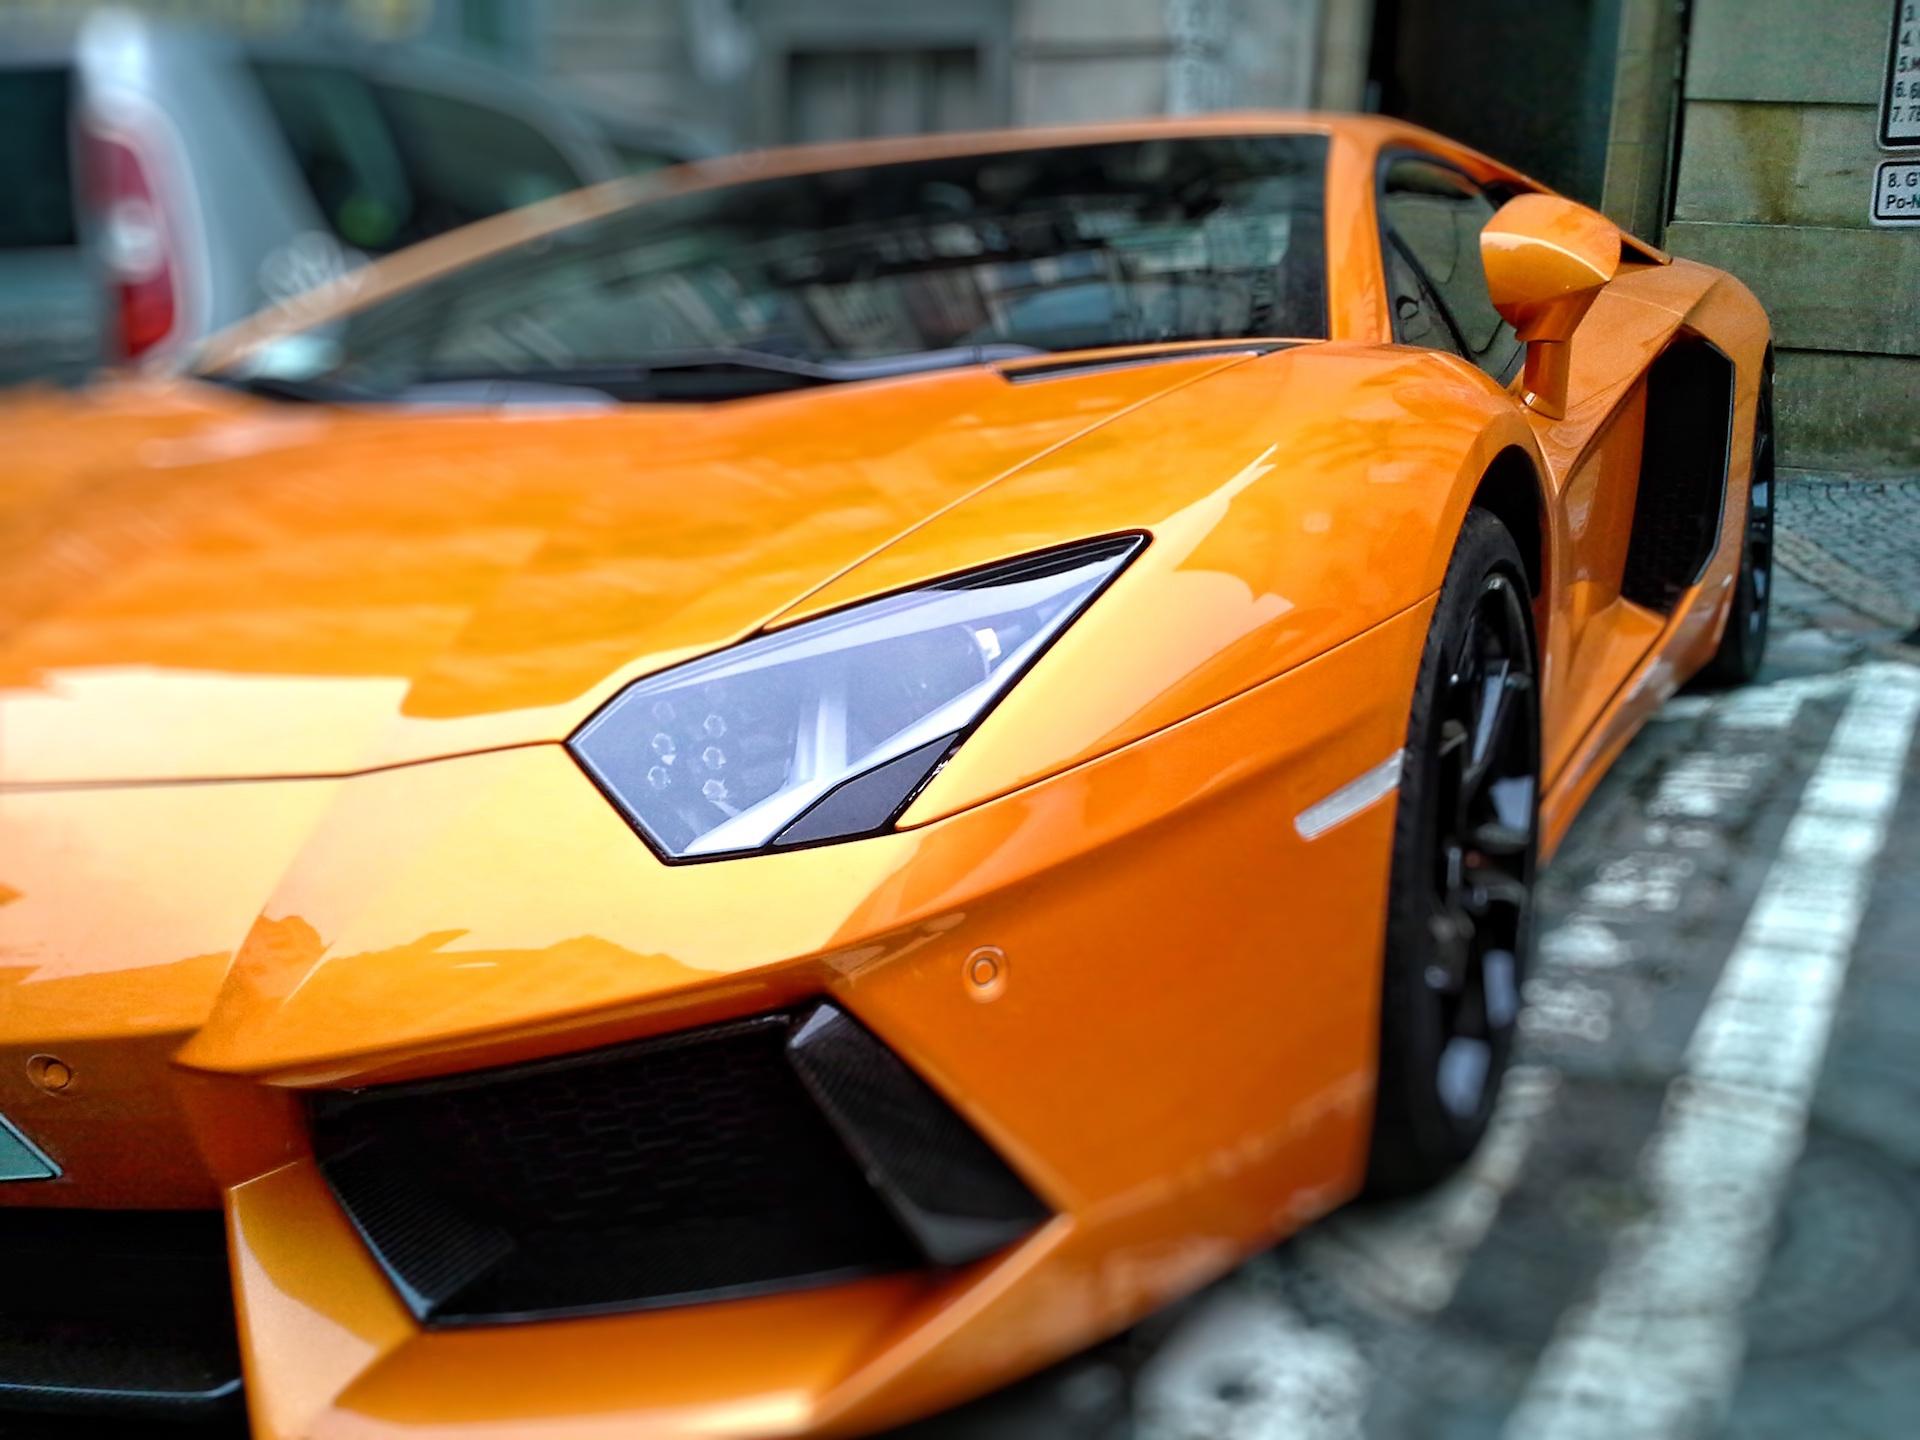 Auto, Lamborghini, Luxus, Sport, Orange - Wallpaper HD - Prof.-falken.com